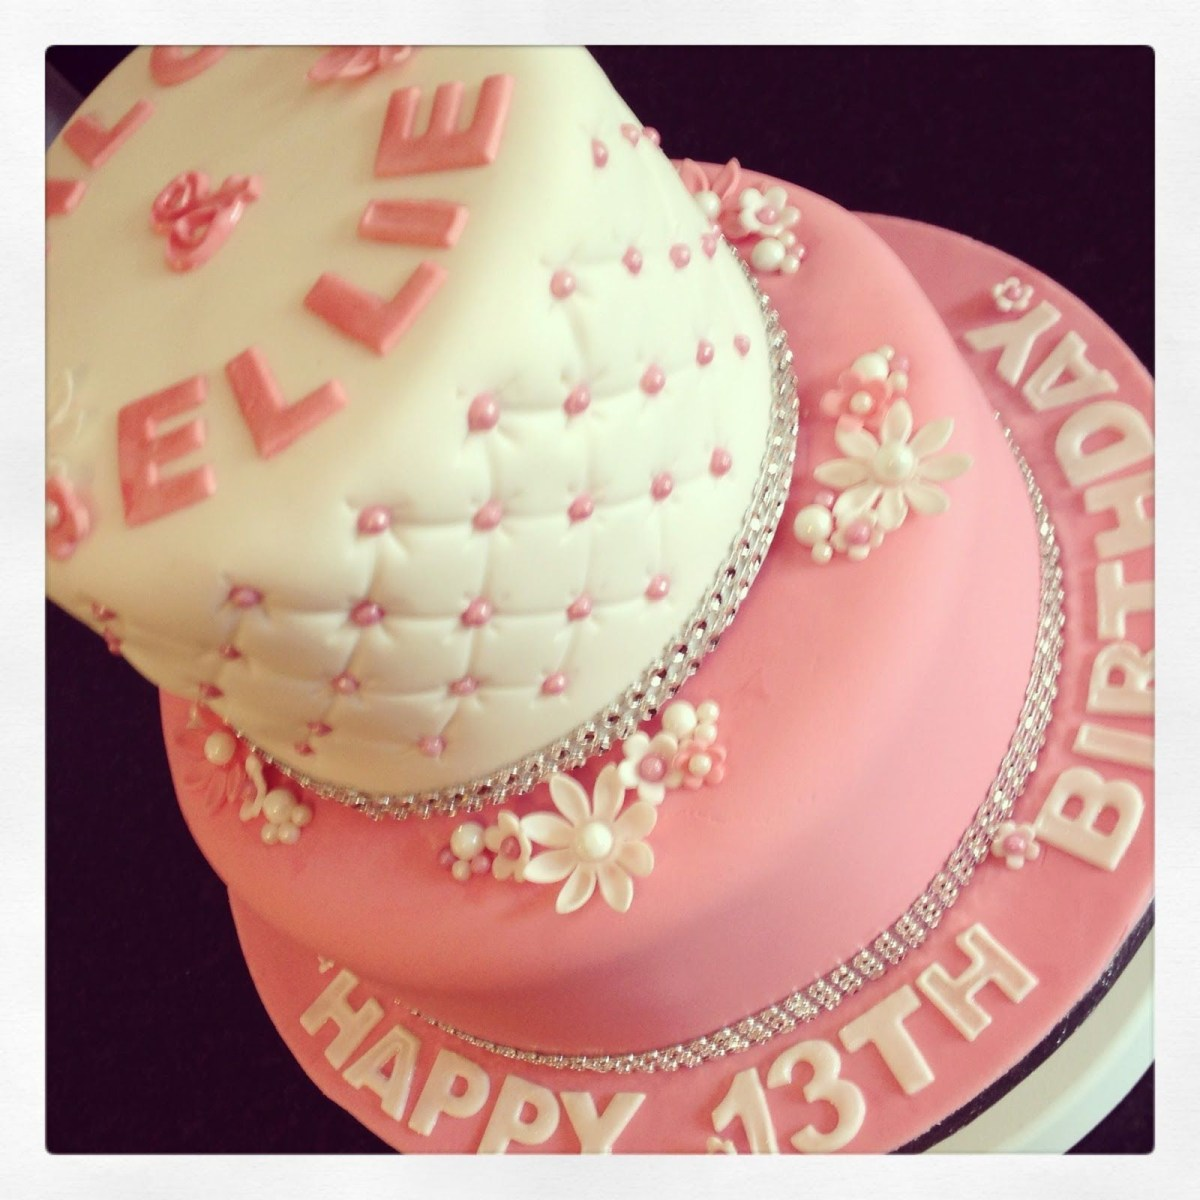 Super Teenage Birthday Cakes 13 Birthday Cakes For Teens Birthday Cakes Funny Birthday Cards Online Elaedamsfinfo